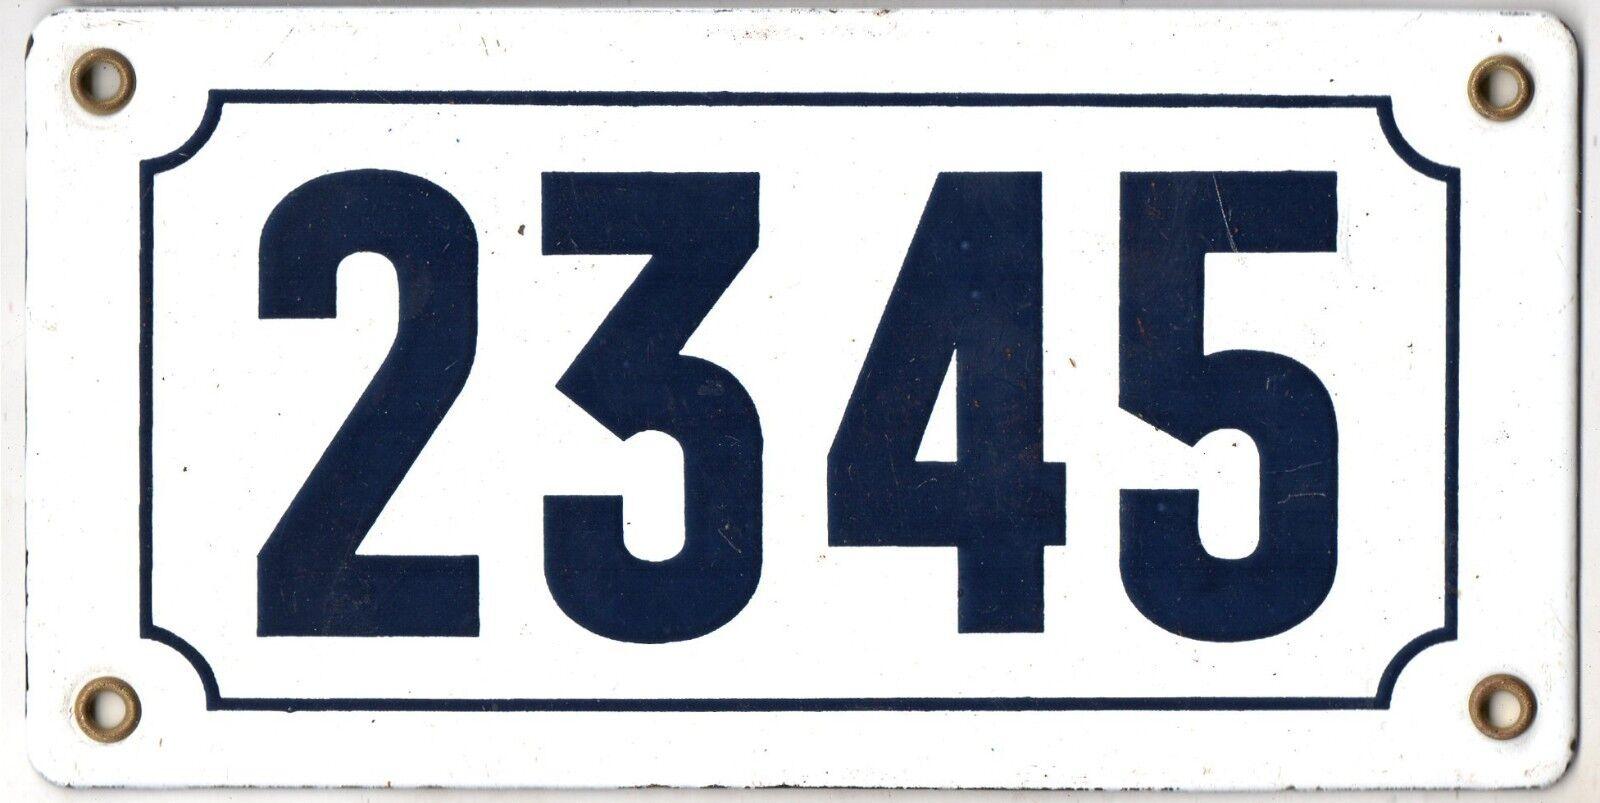 Old French house number 2345 door gate plate plaque enamel steel metal sign